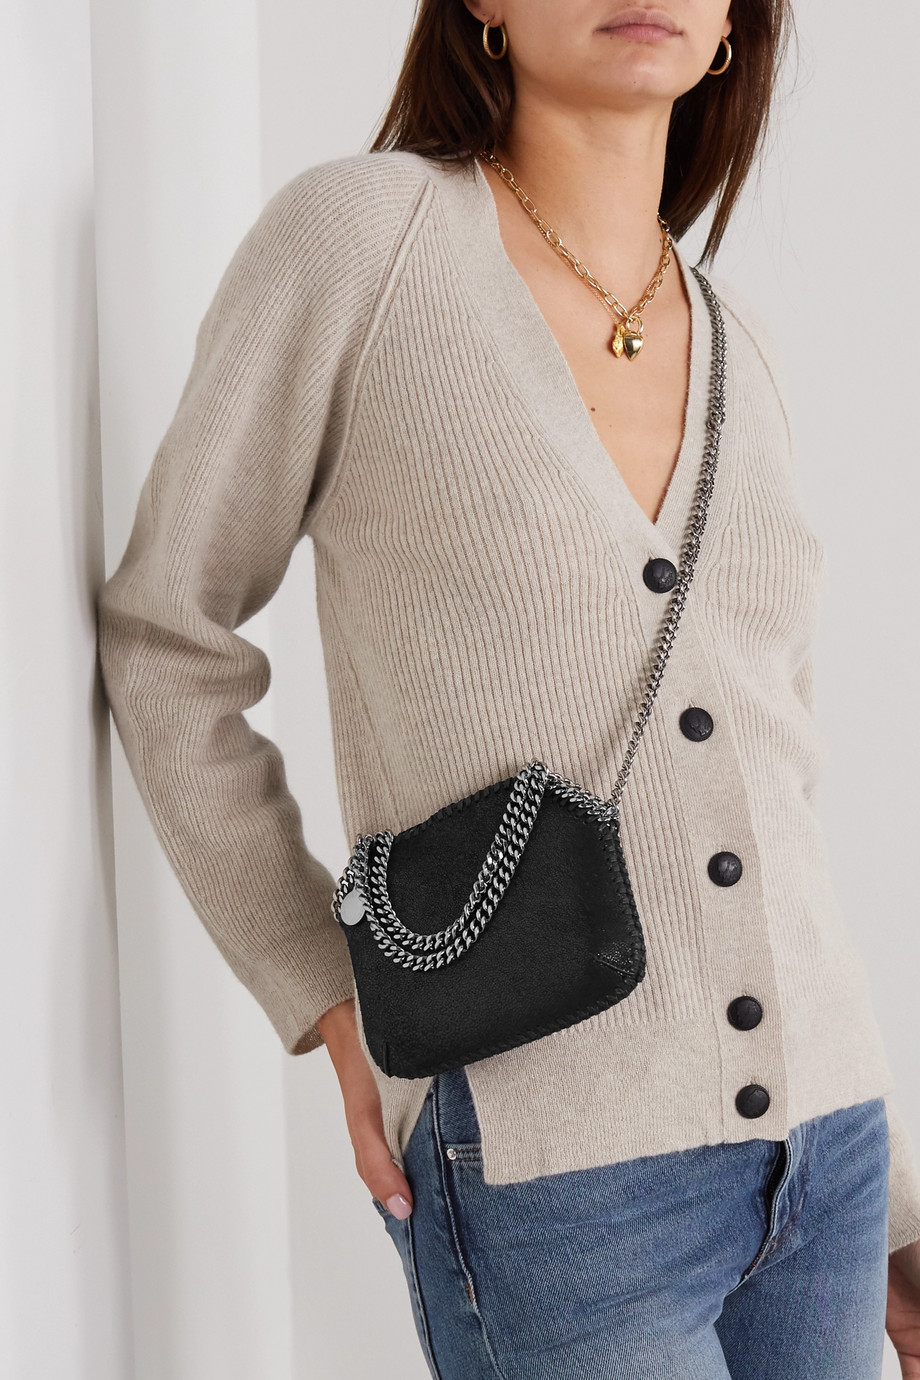 Stella McCartney Falabella 植物性磨砂皮革迷你单肩包